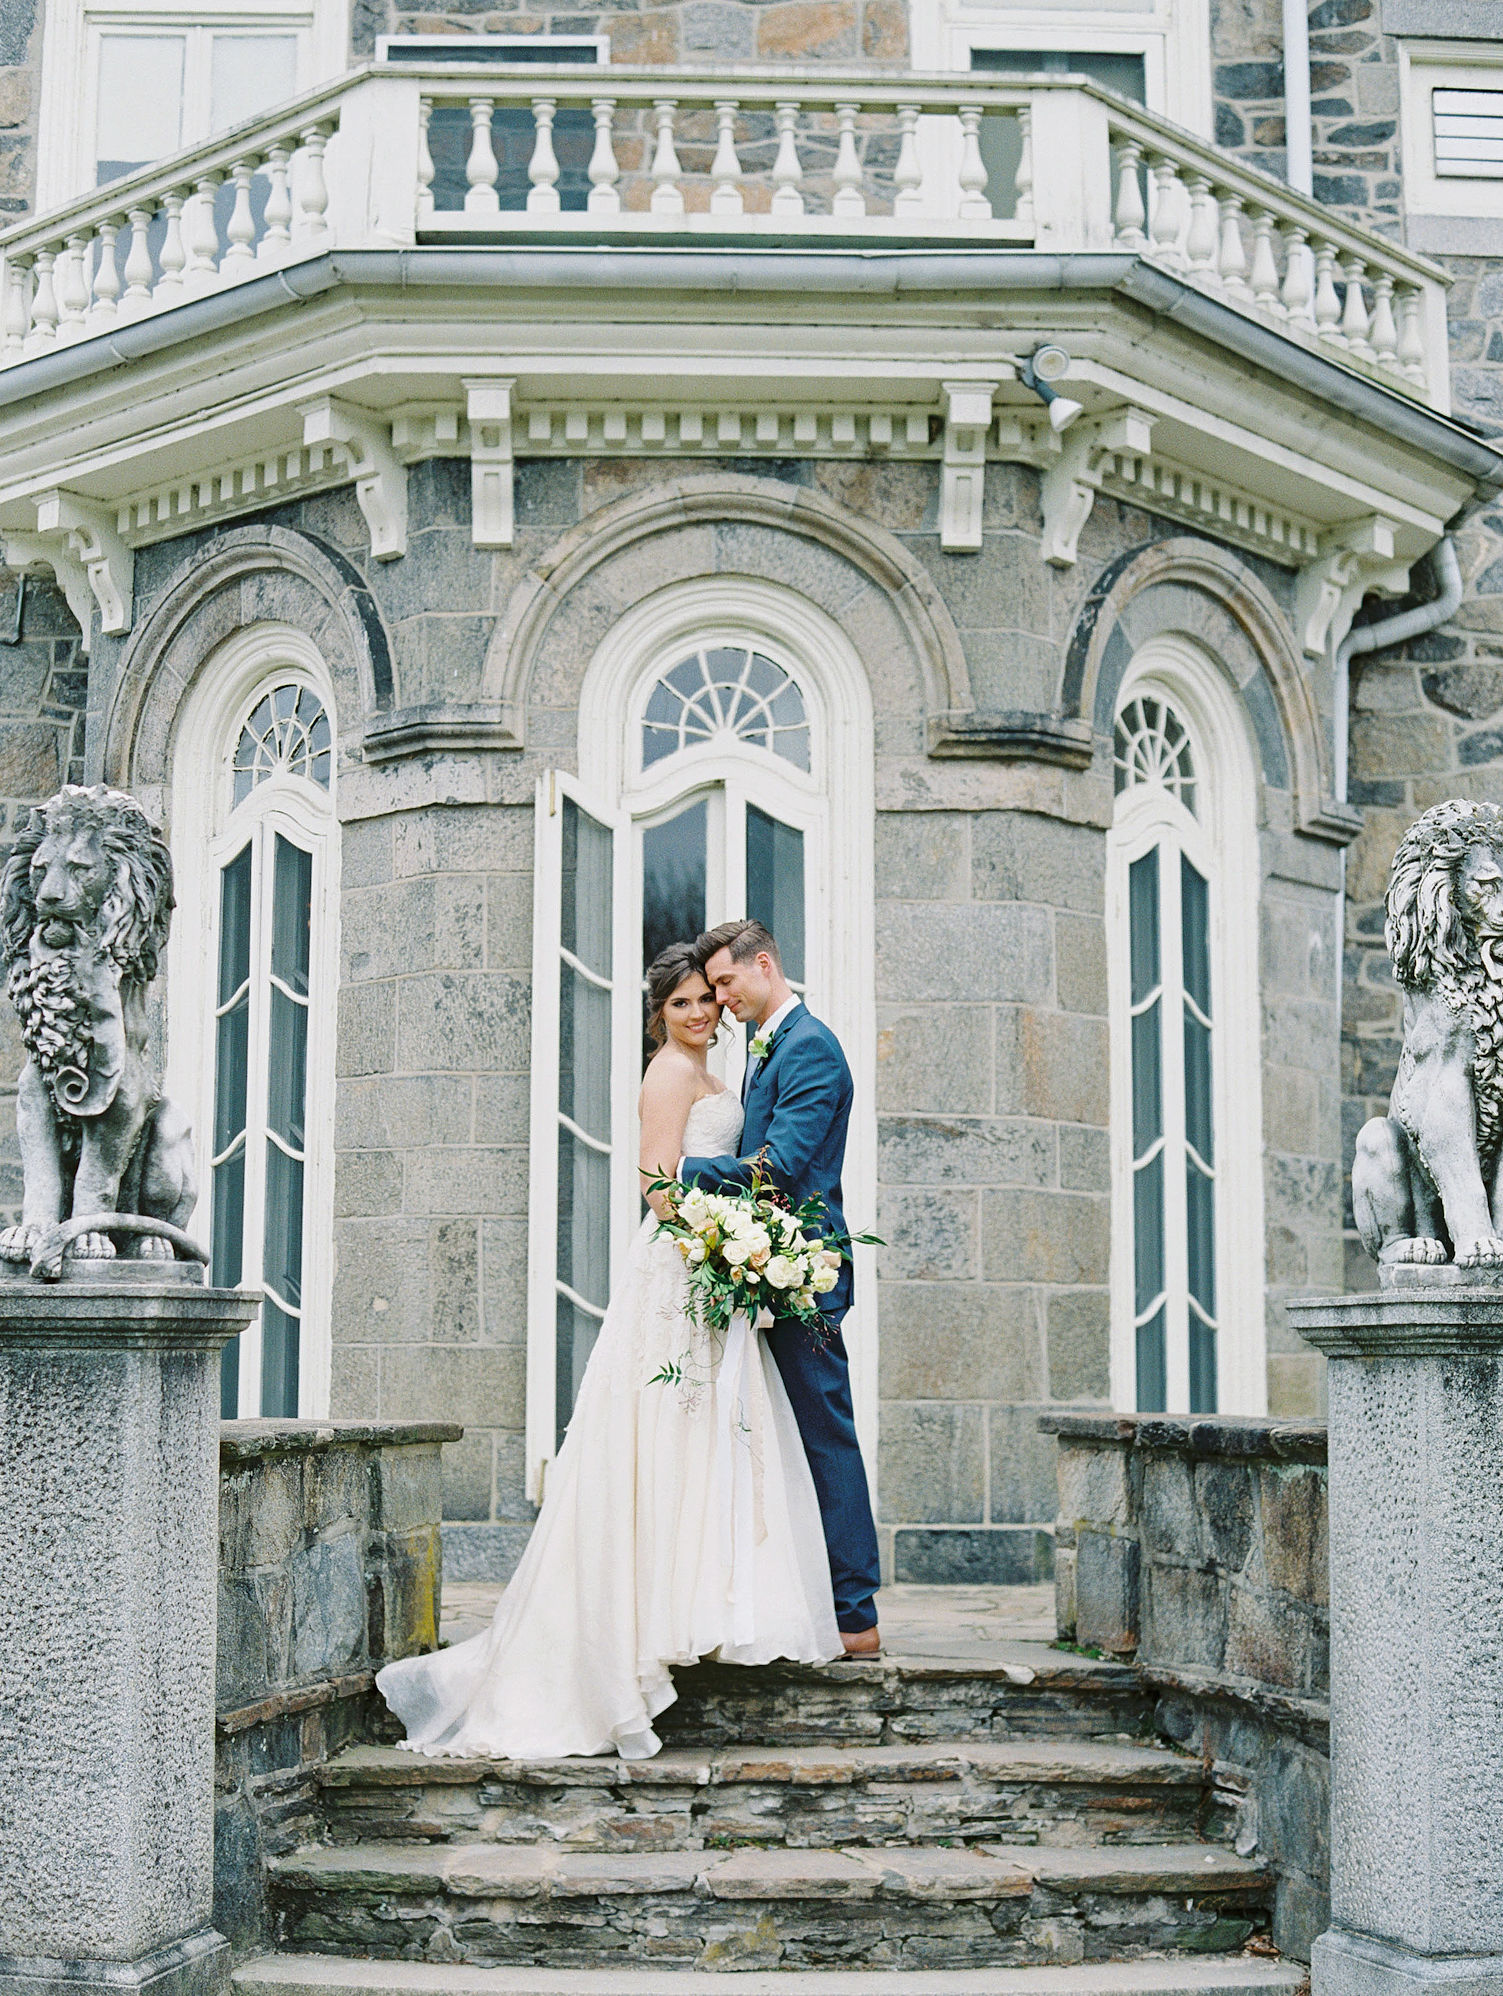 French Castle Wedding Portraits